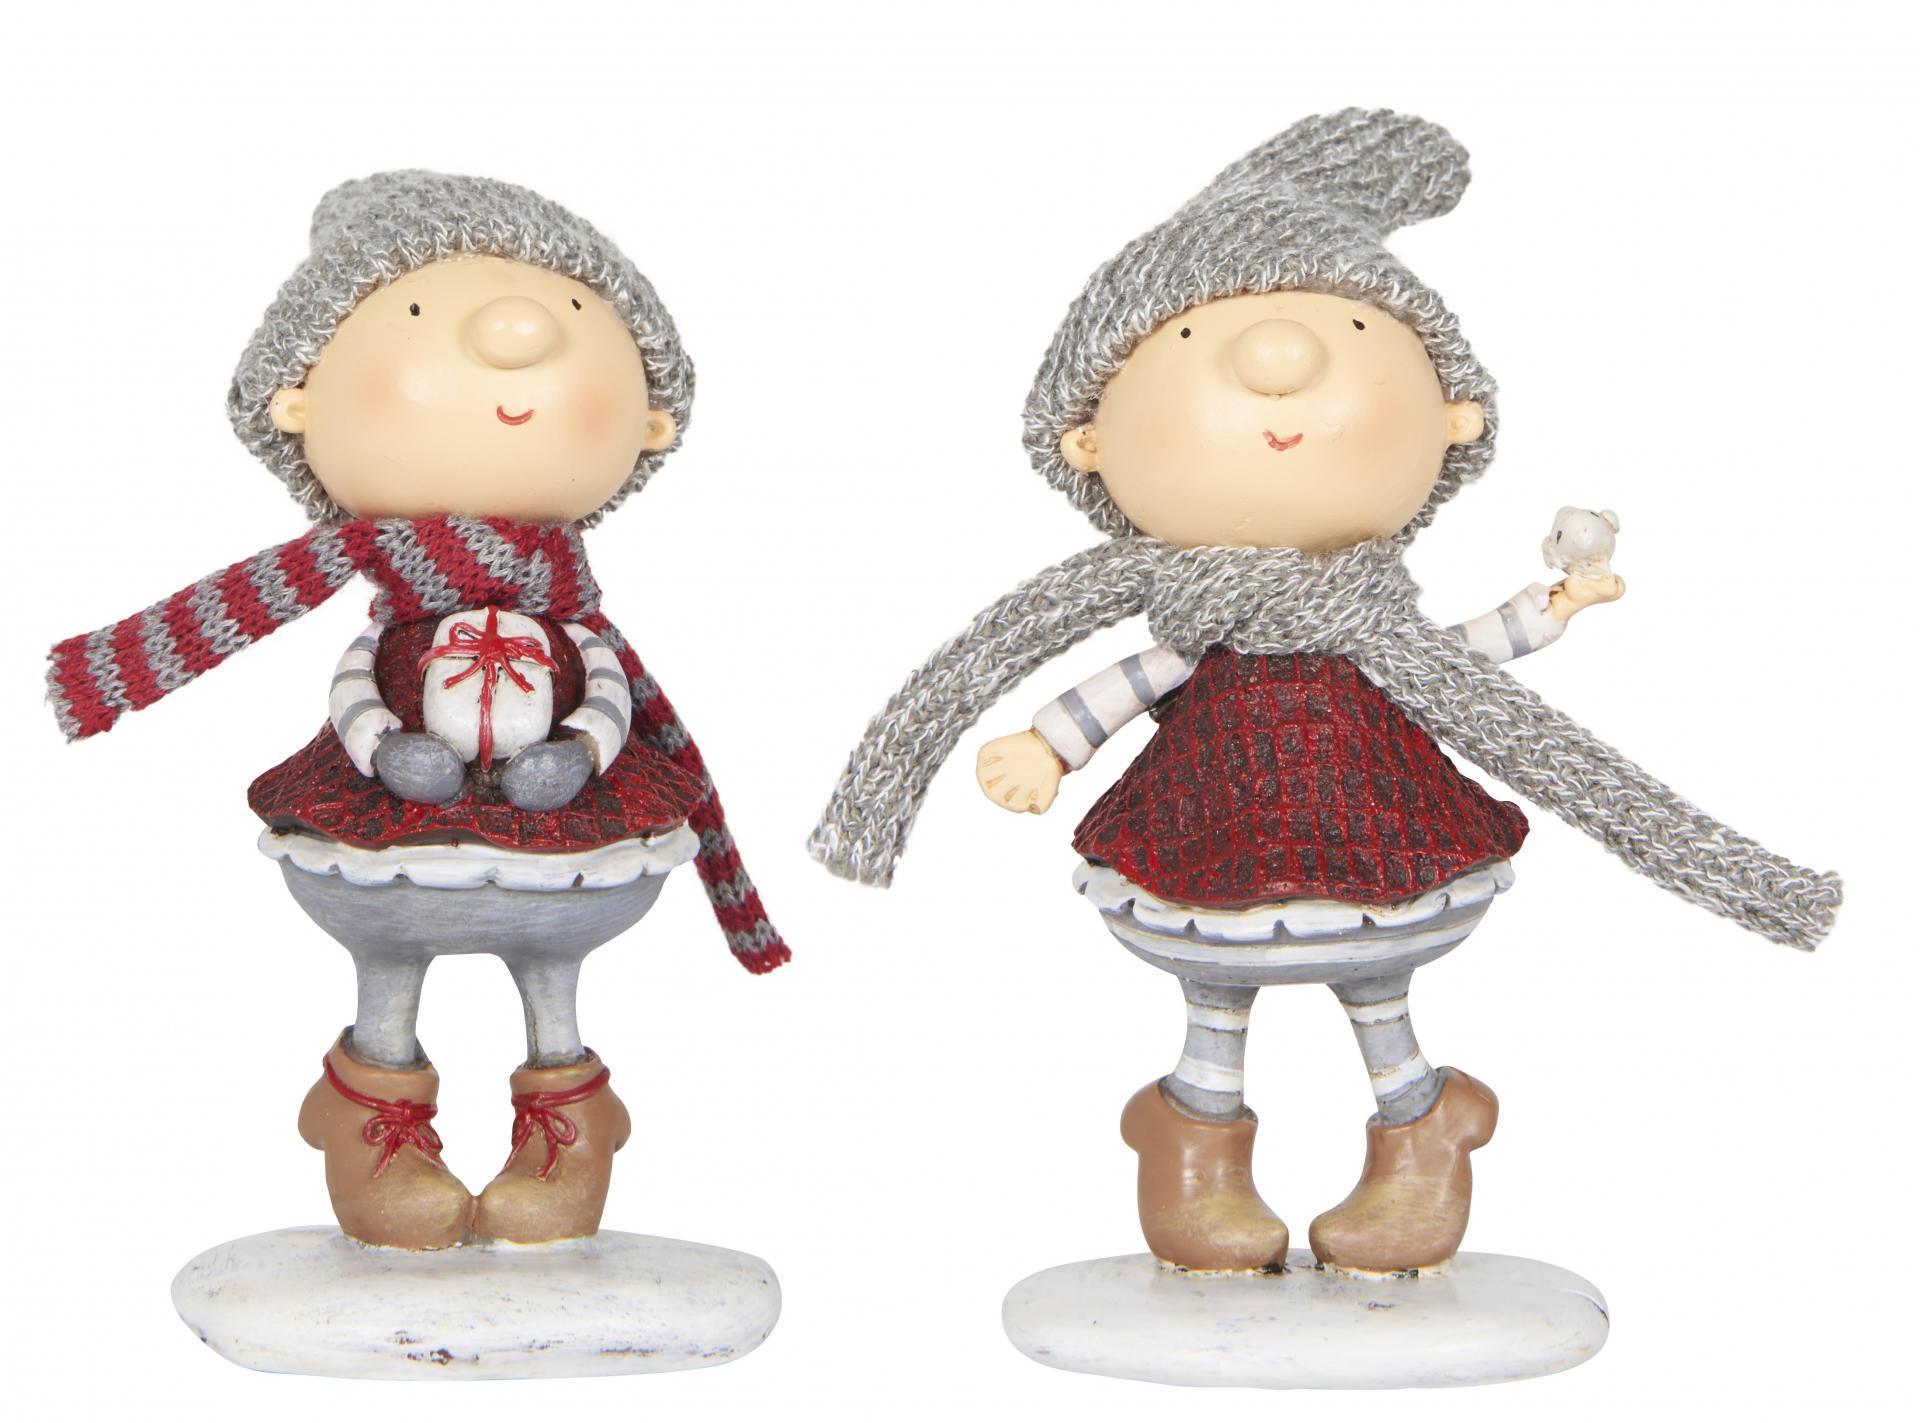 IB LAURSEN Vánoční figurka Santa's helper holčička Typ A (s dárečkem), červená barva, šedá barva, pryskyřice